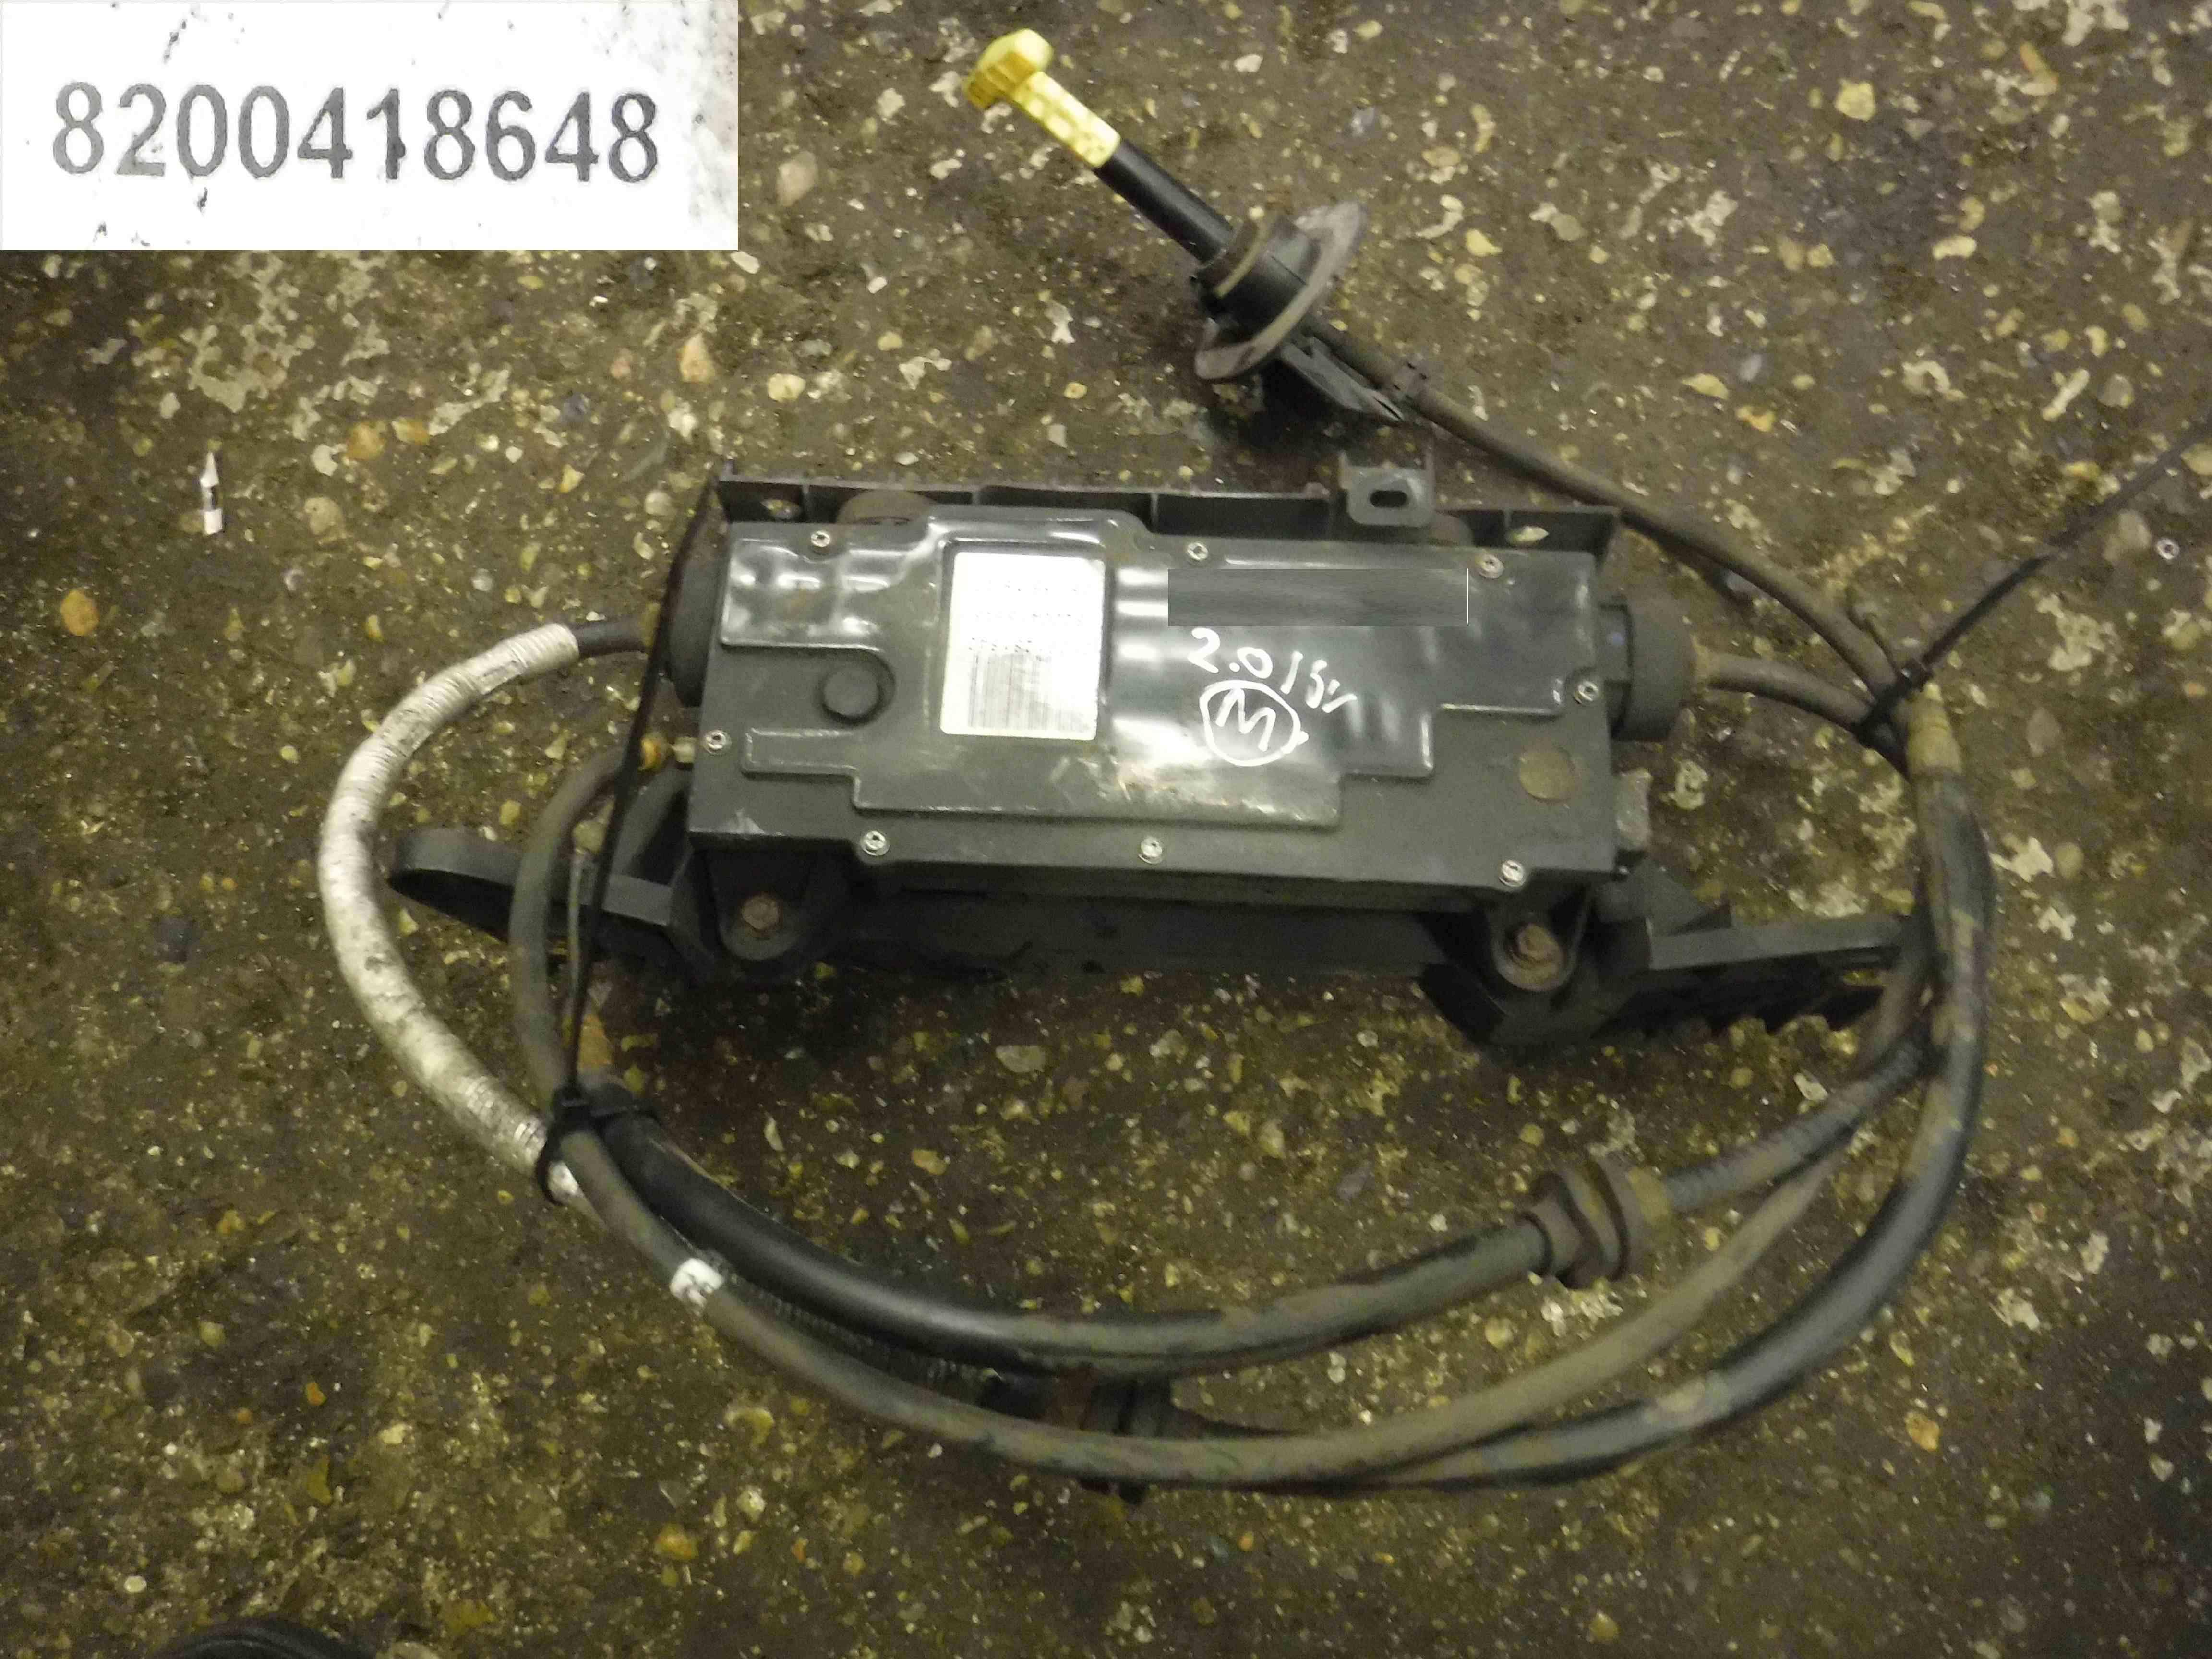 Renault Grand Scenic 2003-2009 Electronic Handbrake Motor  Cables 8200418648